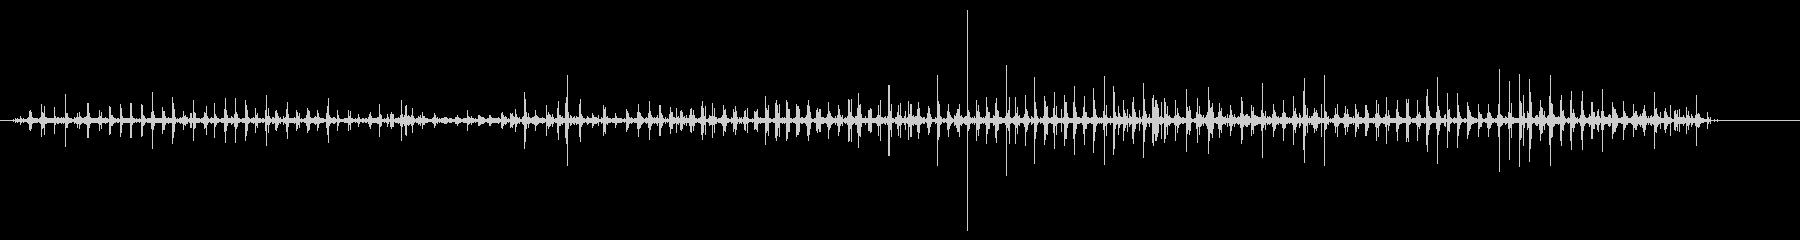 馬-速歩-砂利-乗車-哺乳類2の未再生の波形